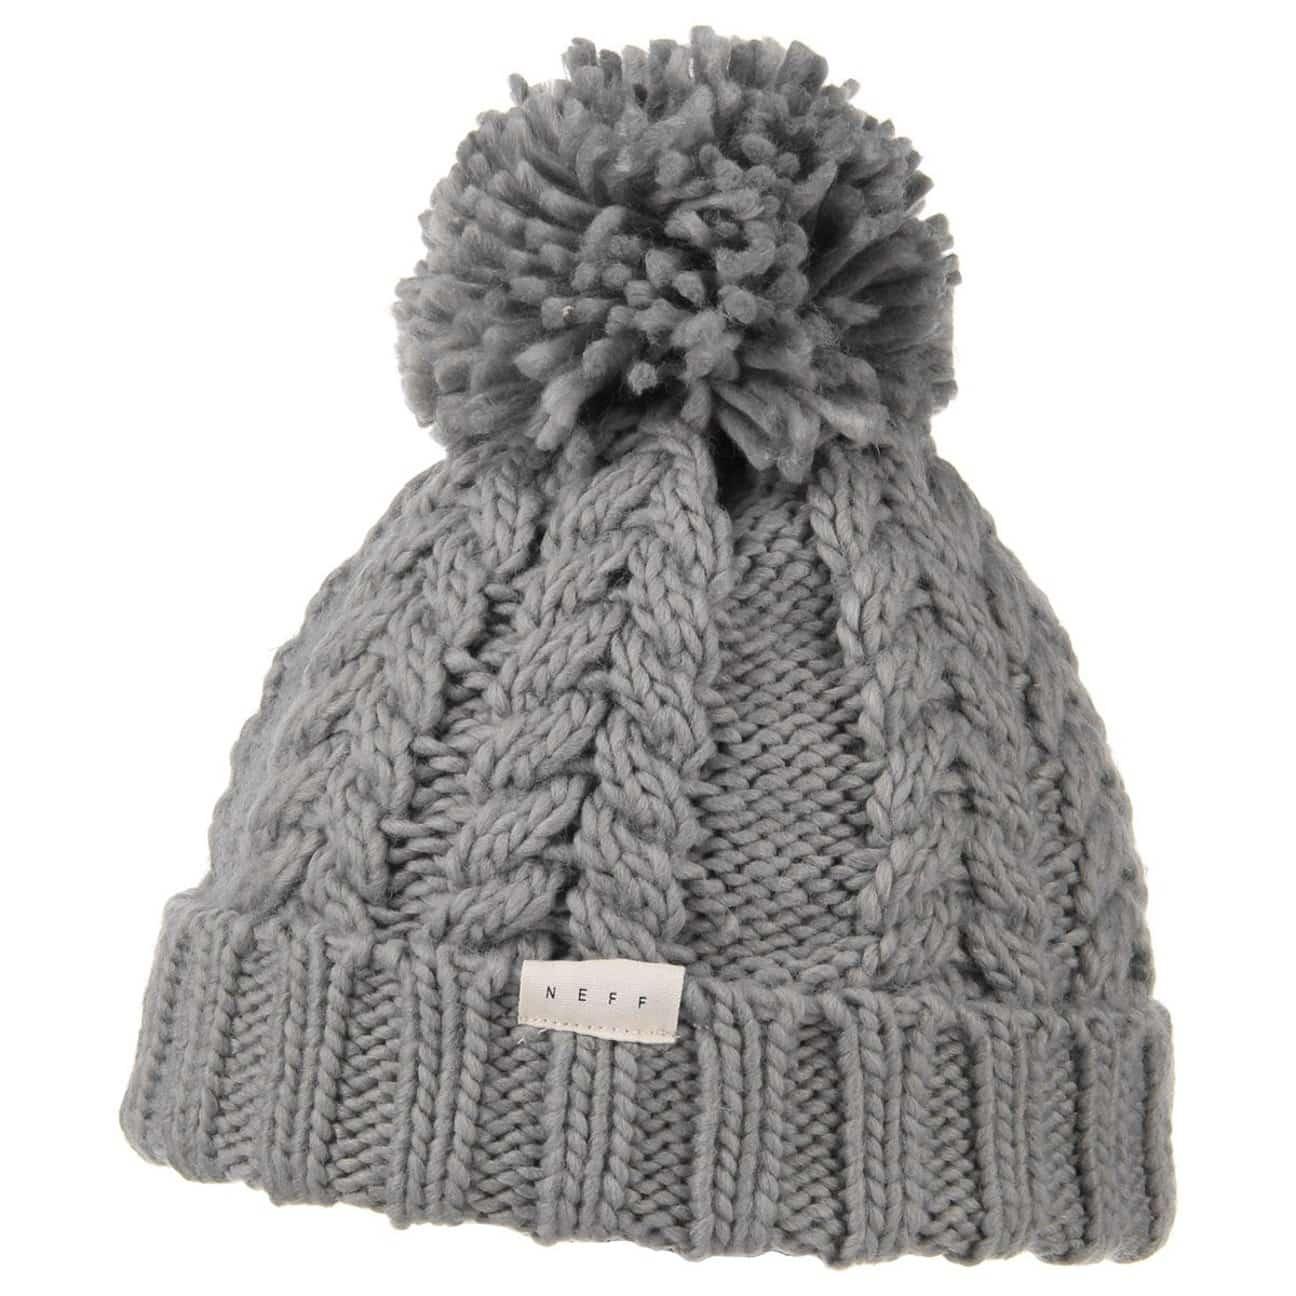 kaycee pompom hat by neff eur 19 95 hats caps beanies shop online. Black Bedroom Furniture Sets. Home Design Ideas